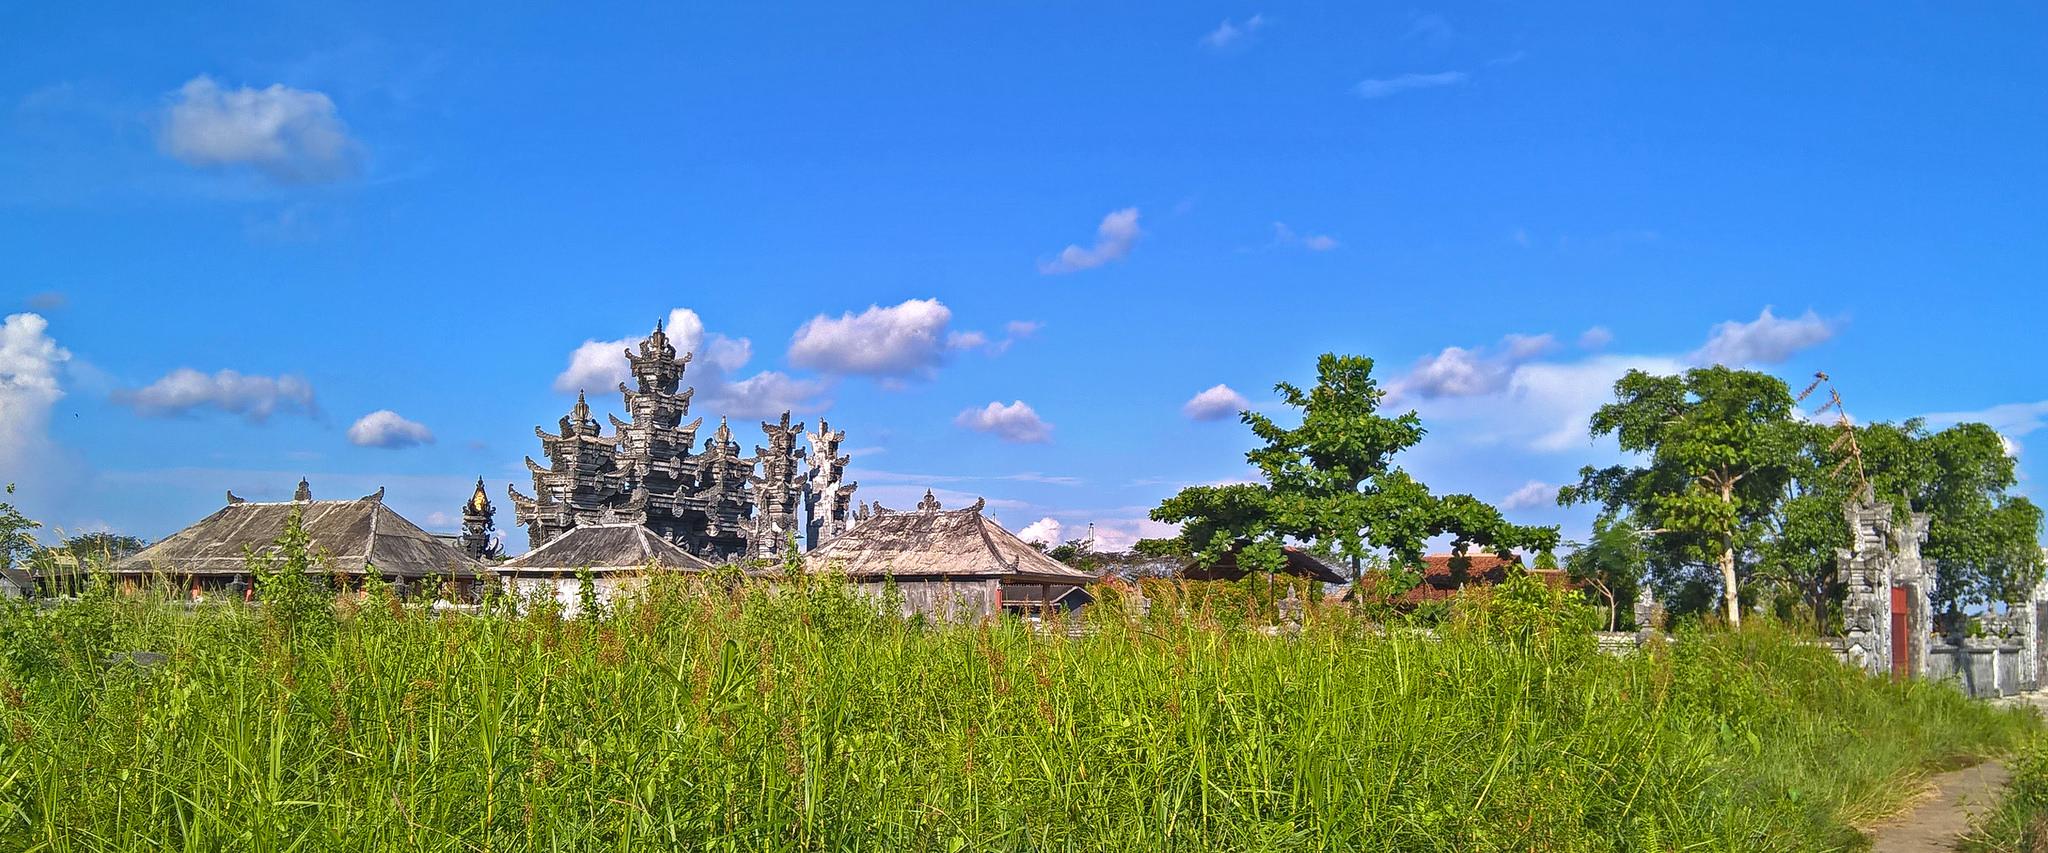 Religious Places Indonesia Mosques Churches Sungai Raya Kab Kubu Prov